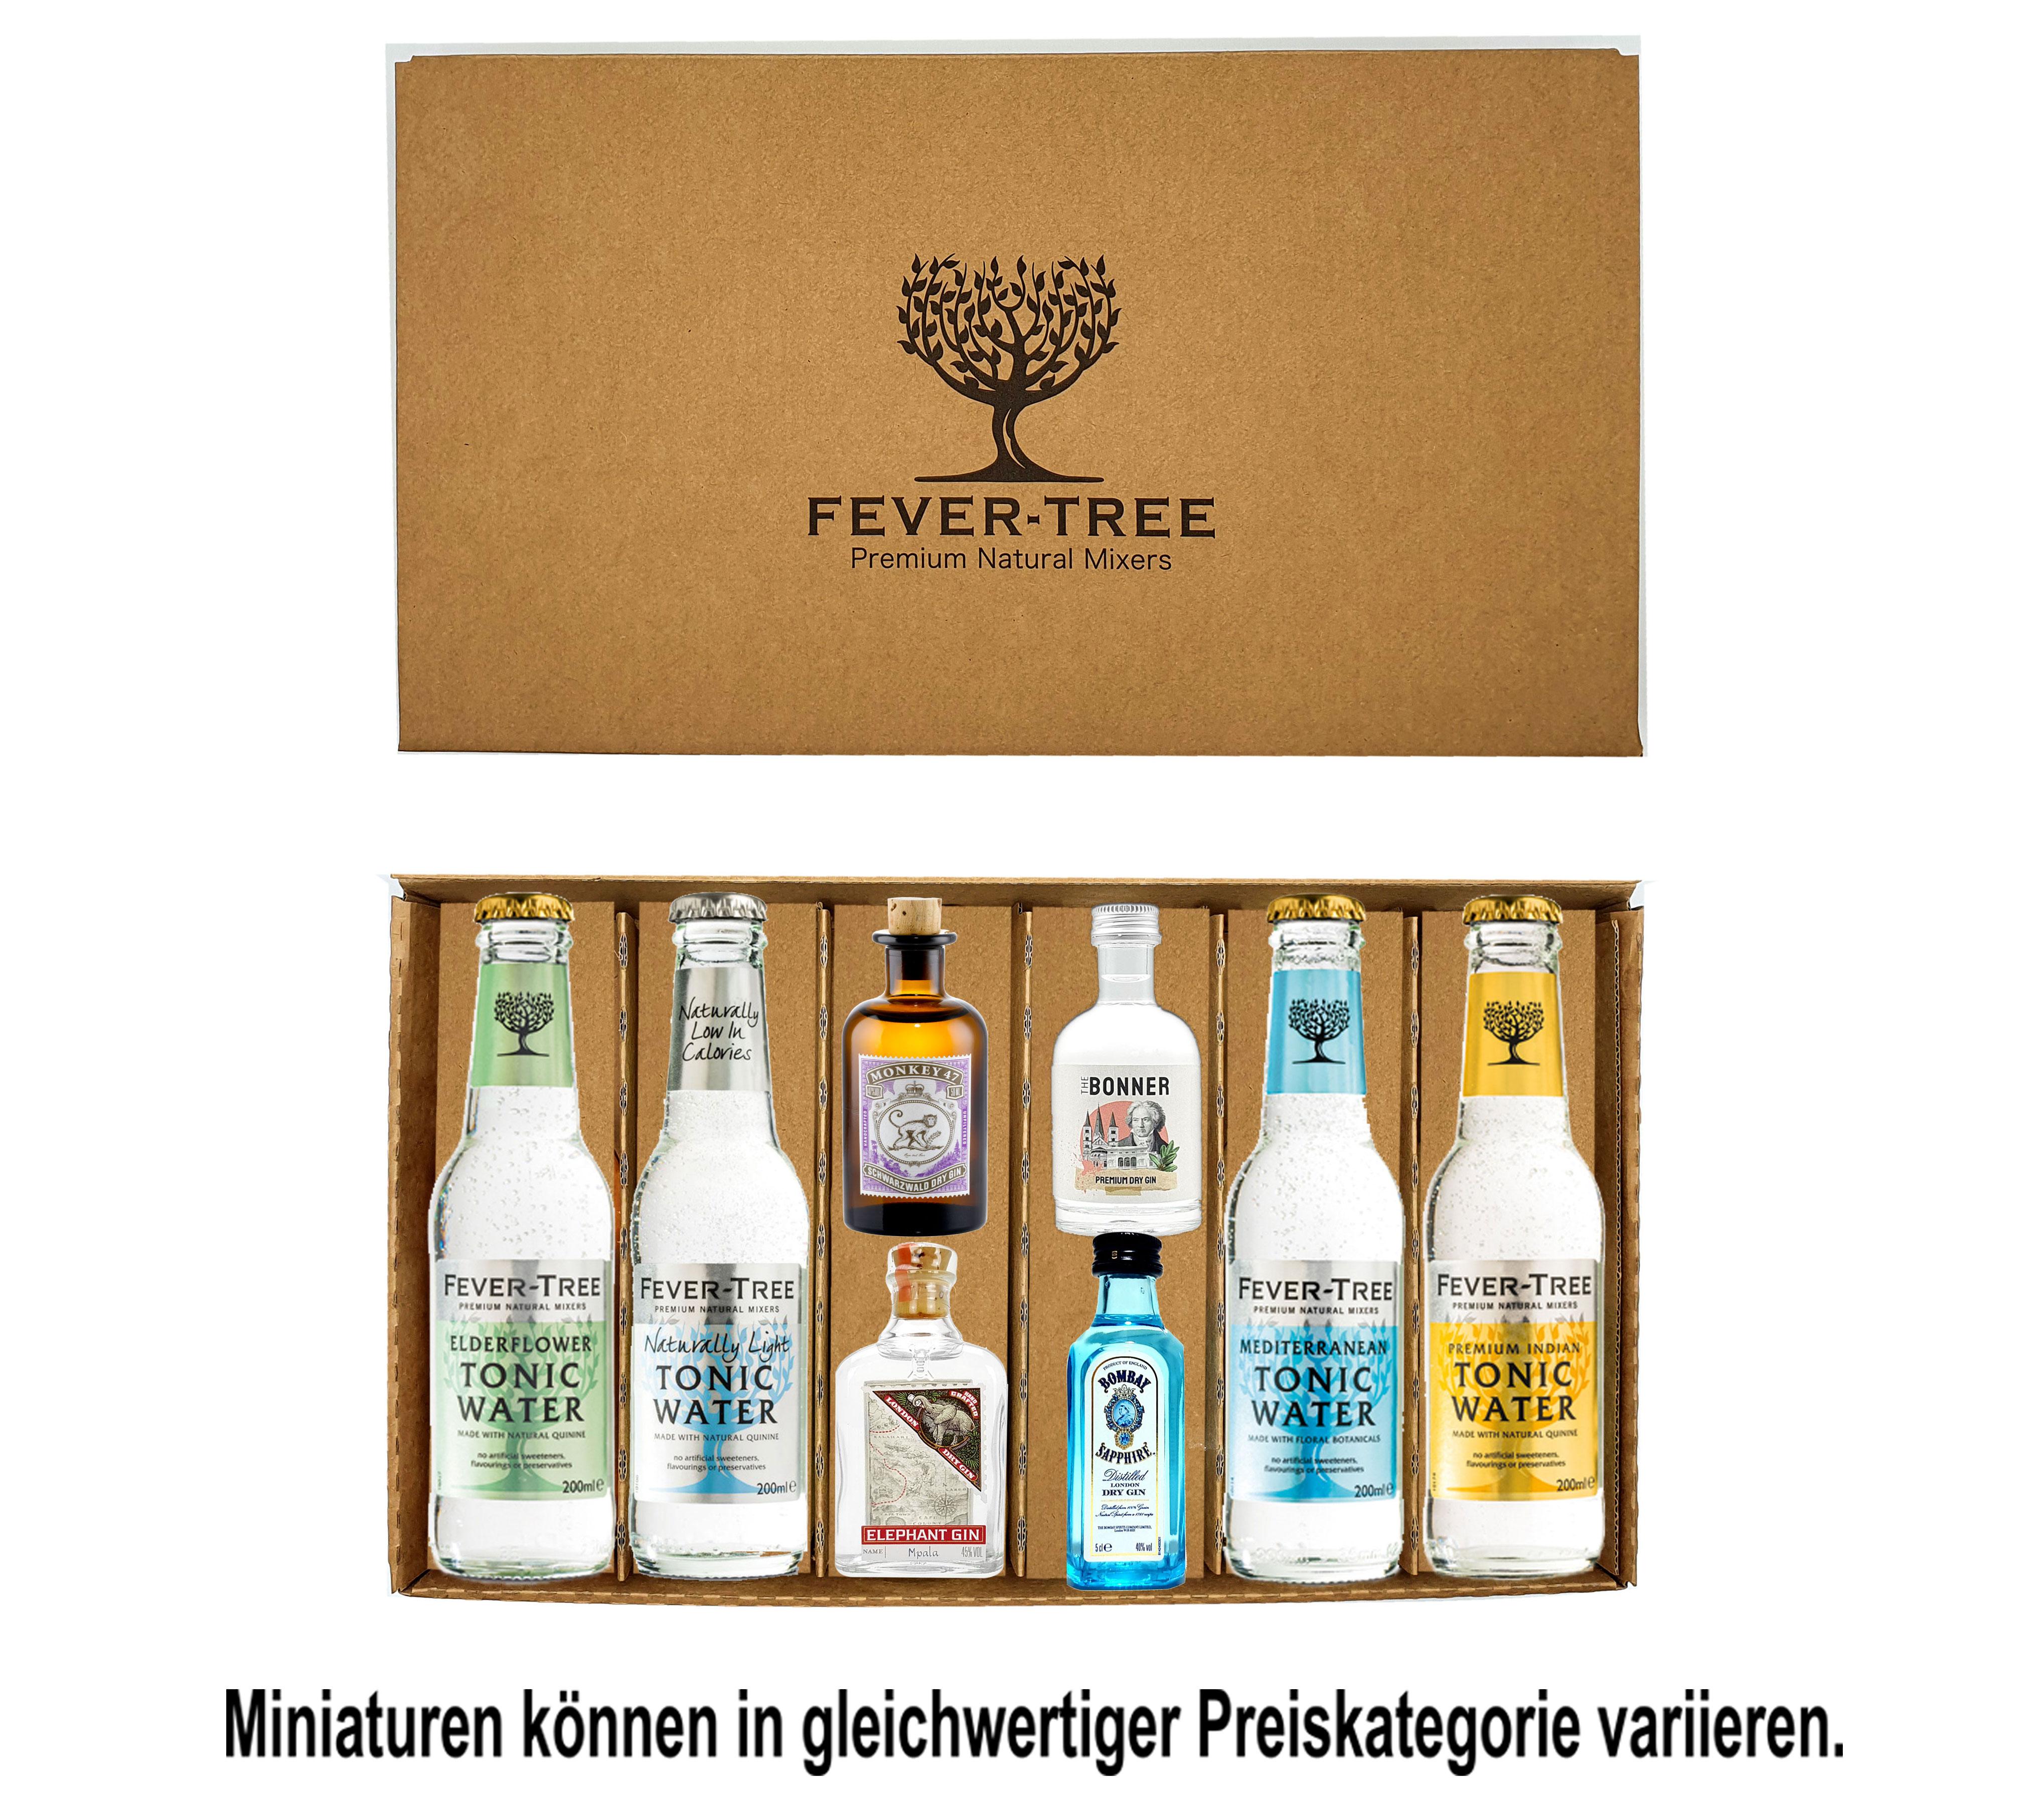 Fever-Tree Gin Tonic Geschenkset - 4x verschiedene Mini Gins + 4x Fever-Tree verschiedene Tonic Water - Inkl. Pfand MEHRWEG